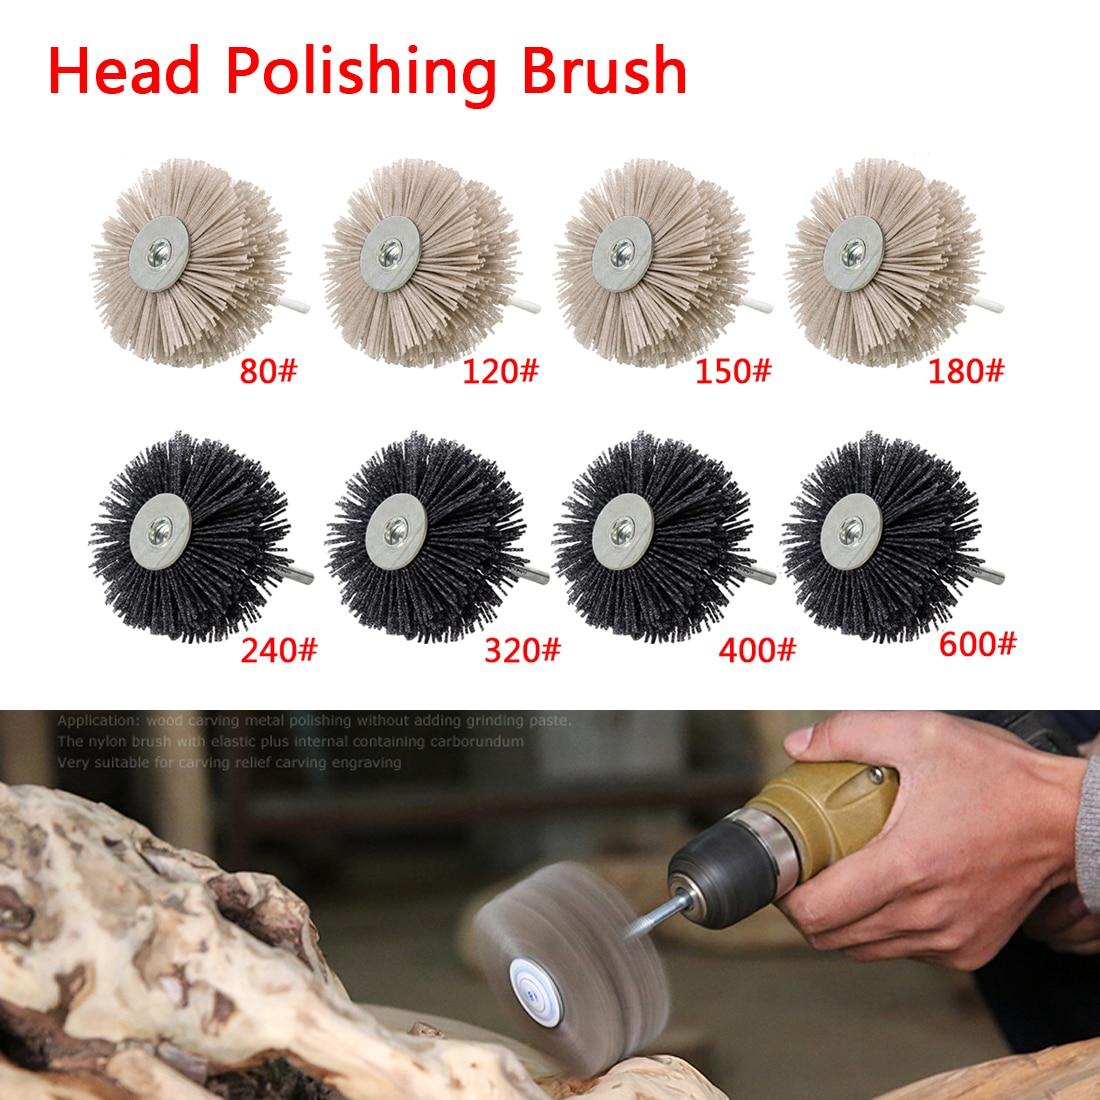 Bright Wood Working Drill Brush Finishing Abrasive Wire Nylon Radial Polishing Brush Cleaning Products